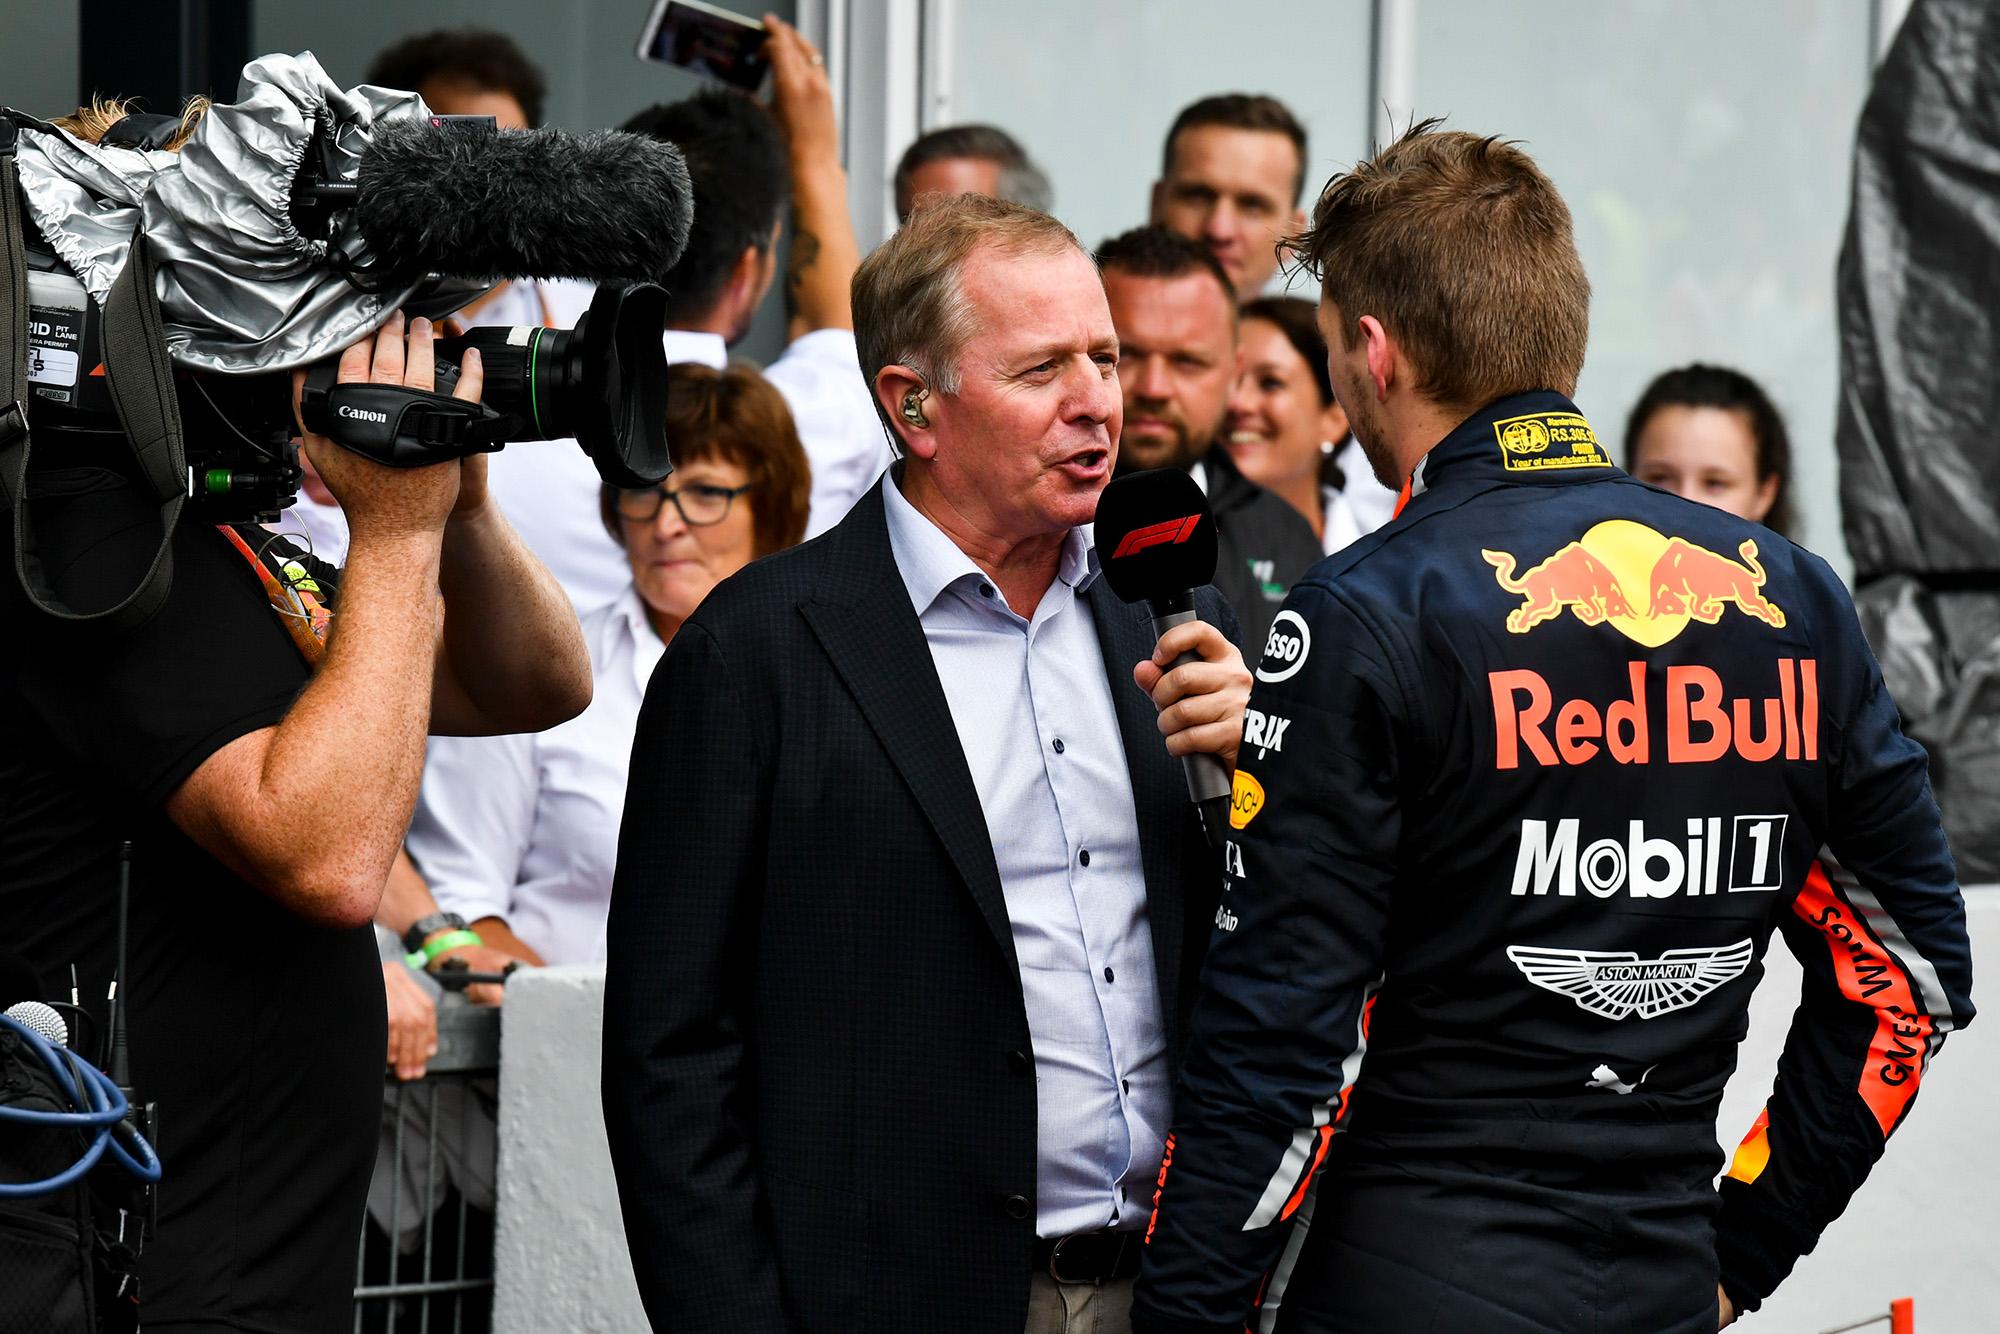 Martin Brundle interviews Max Verstappen after the 2019 Brazilian Grand Prix